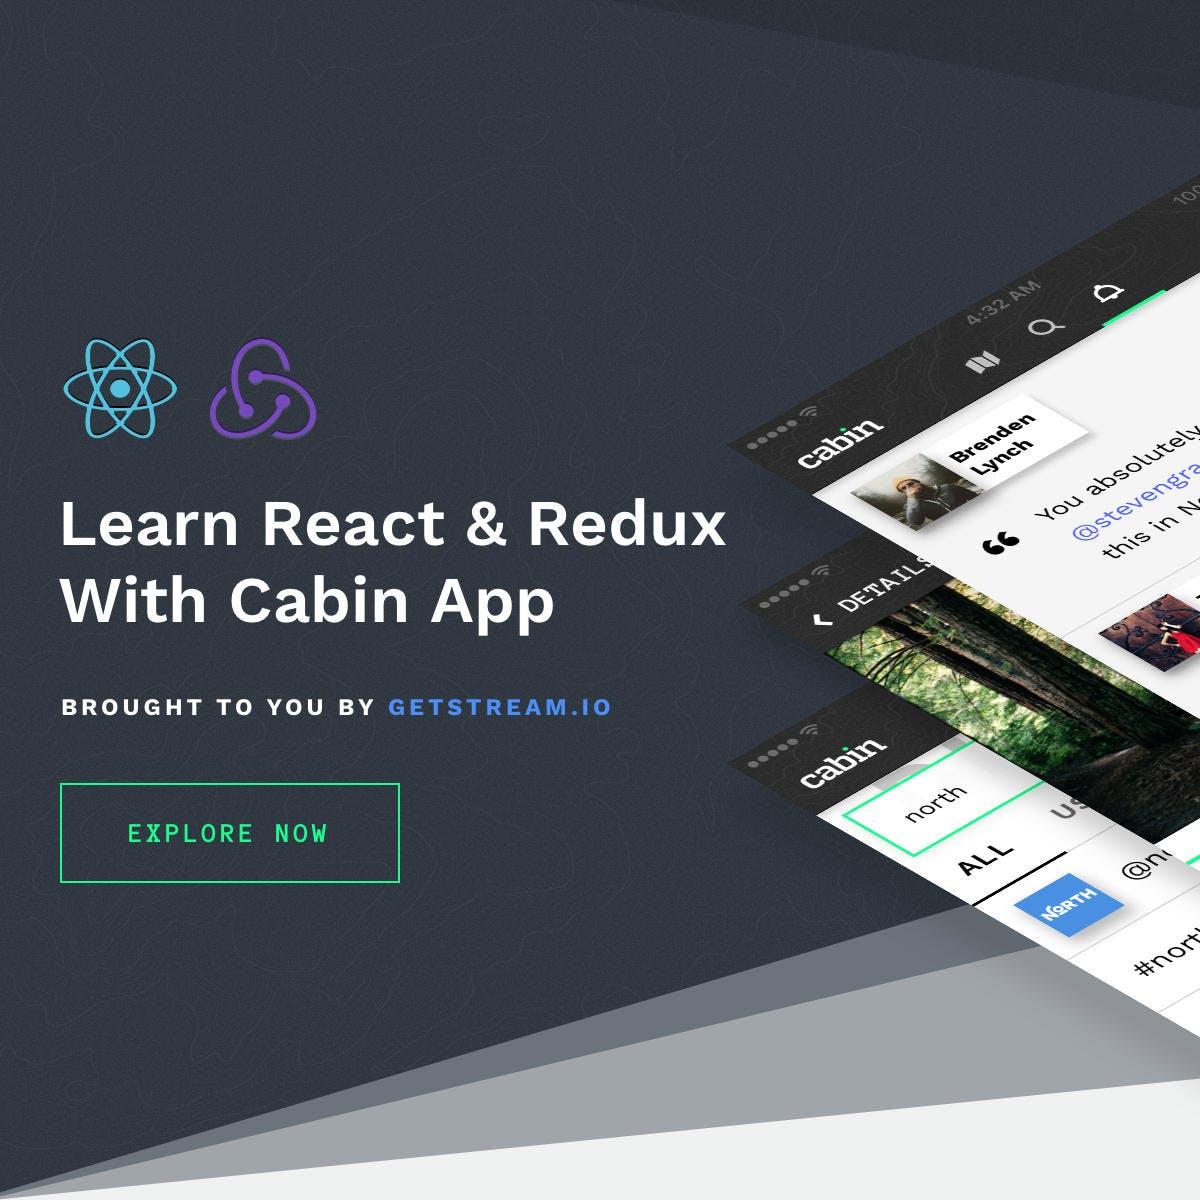 Cabin - A React/Redux Tutorial Series by GetStream.io